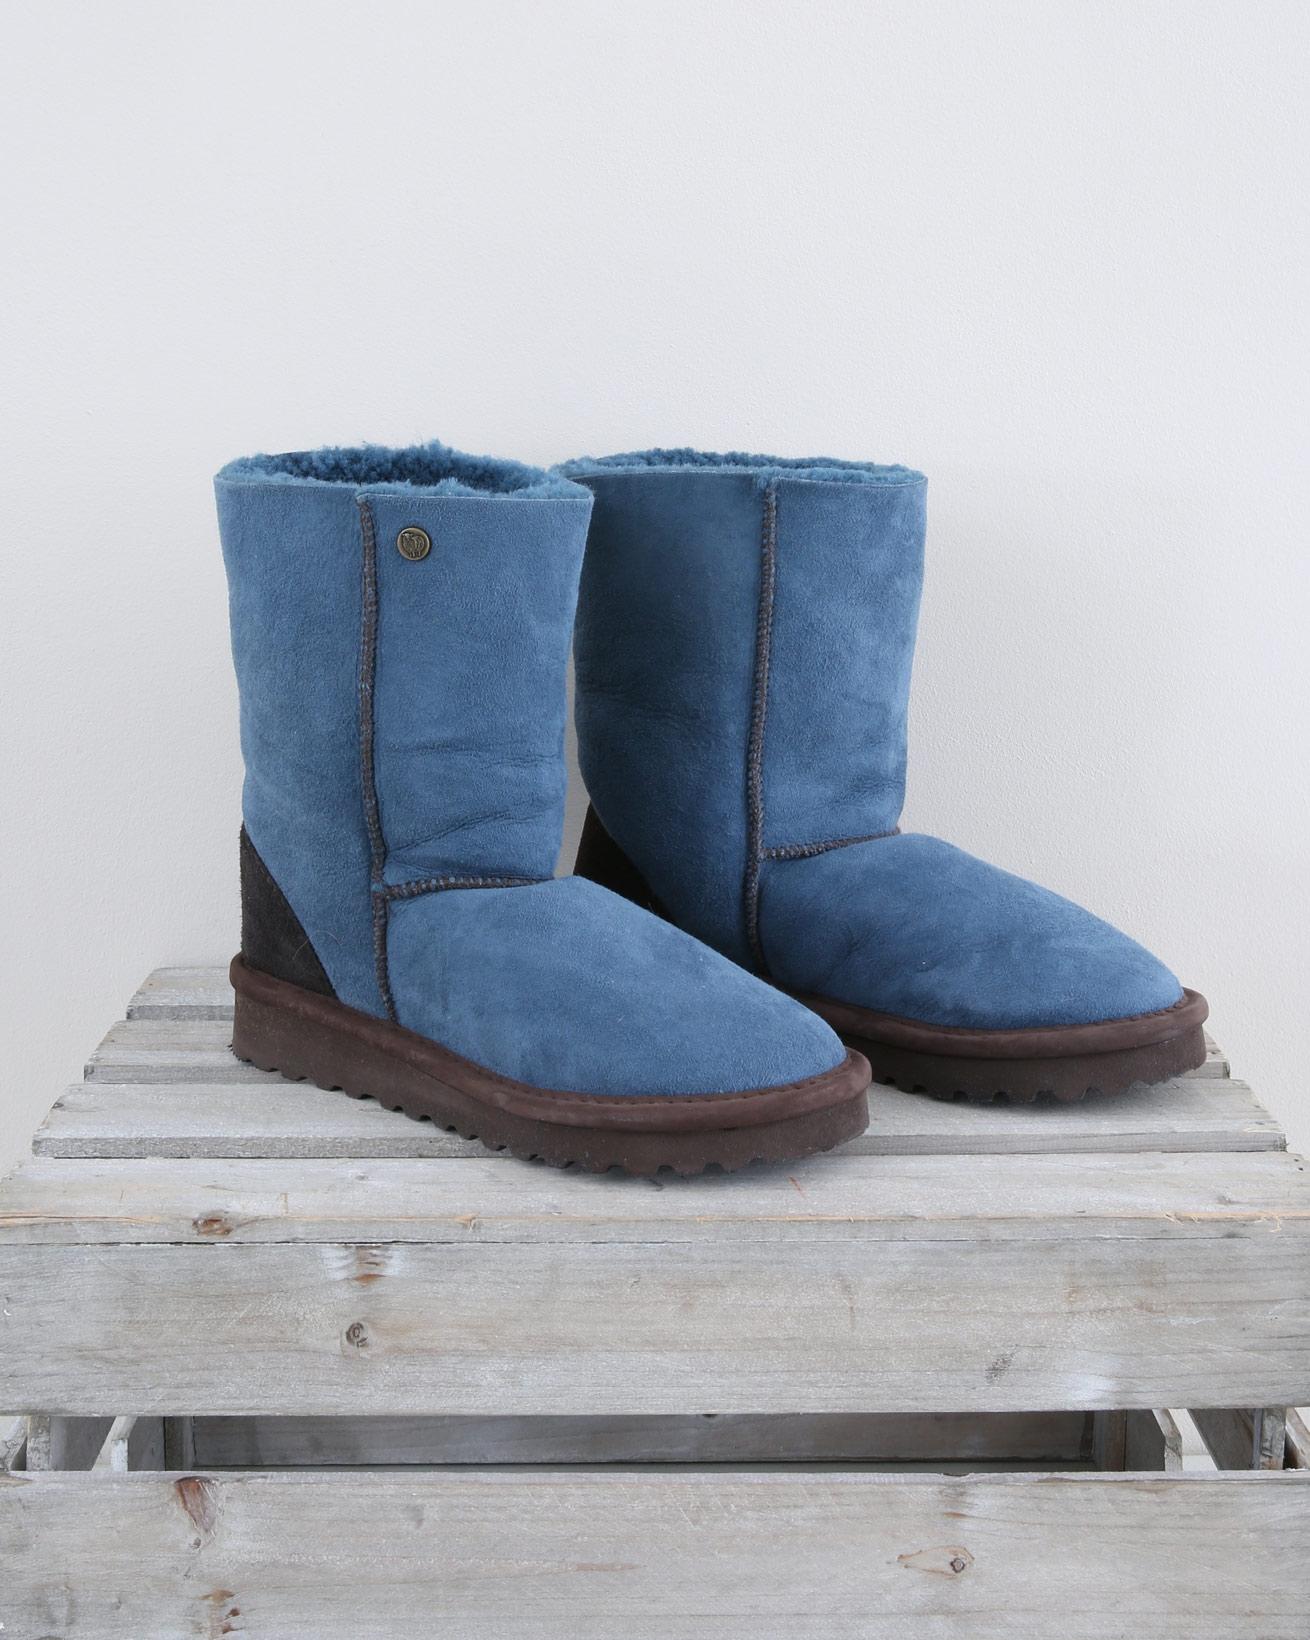 Original Celt Sheepskin Boots REG - Size 6 - Icelandic Blue - 1557